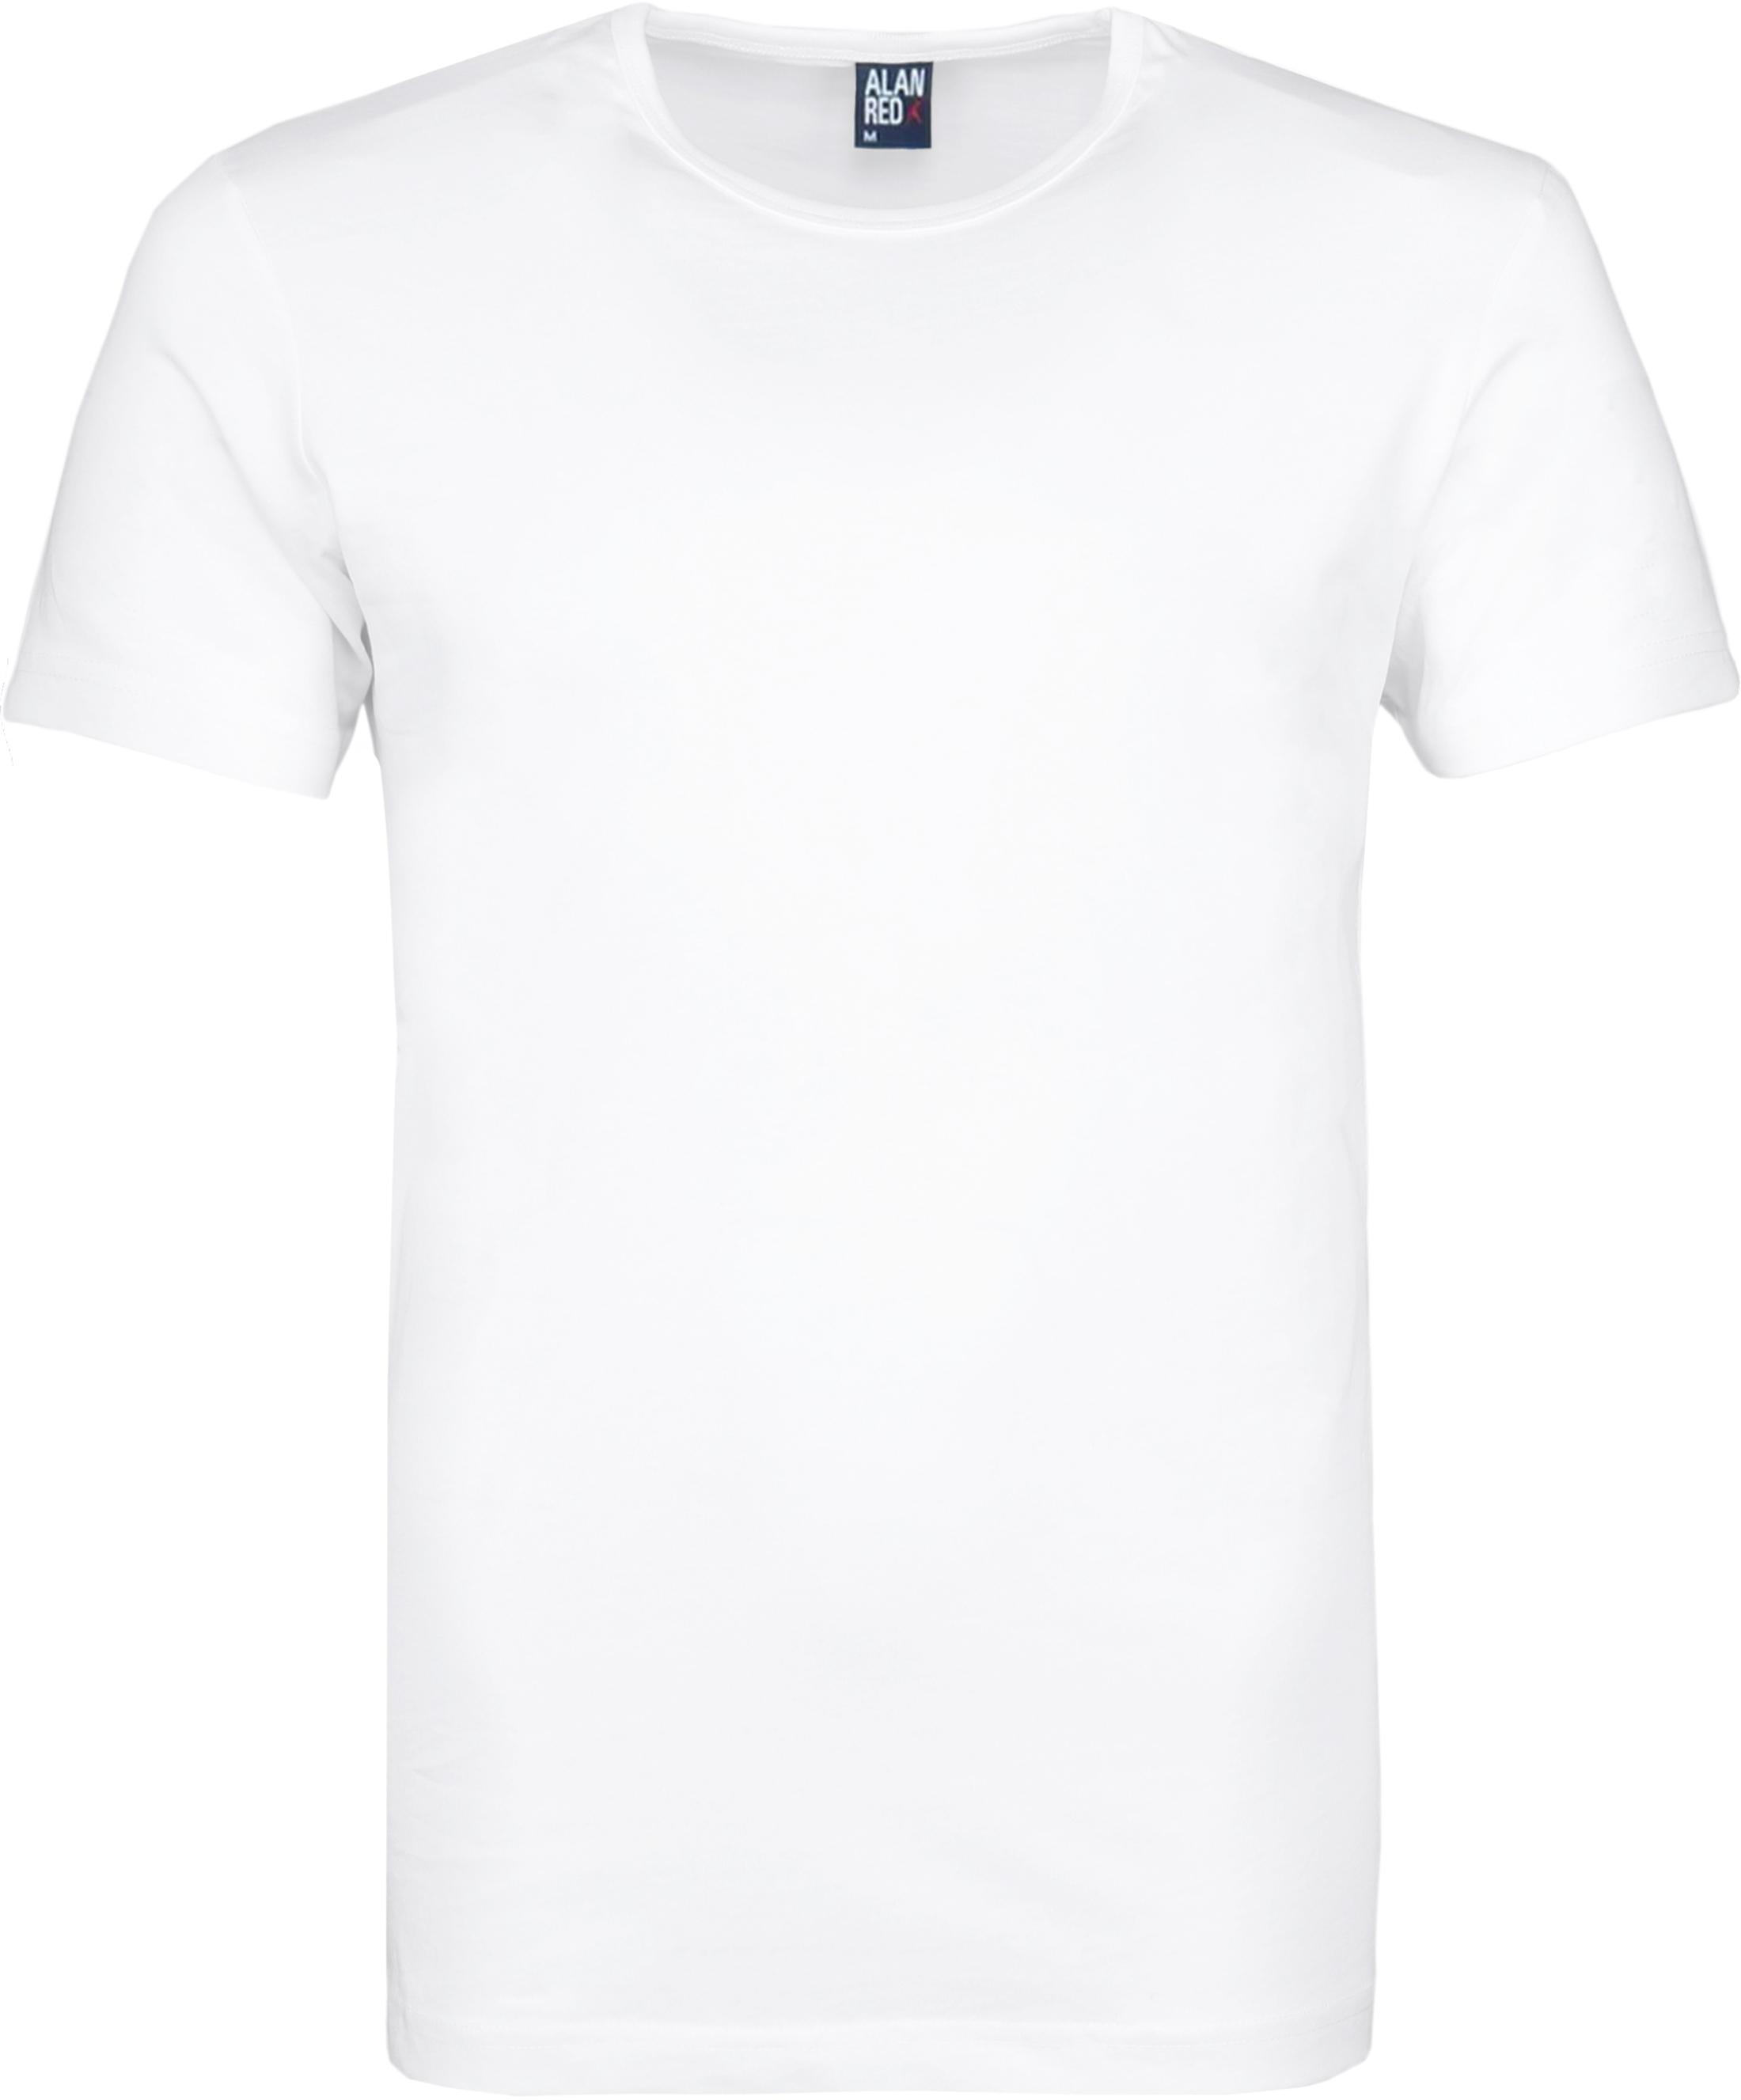 Alan Red Derby O-Hals T-Shirt Wit (2Pack) foto 1